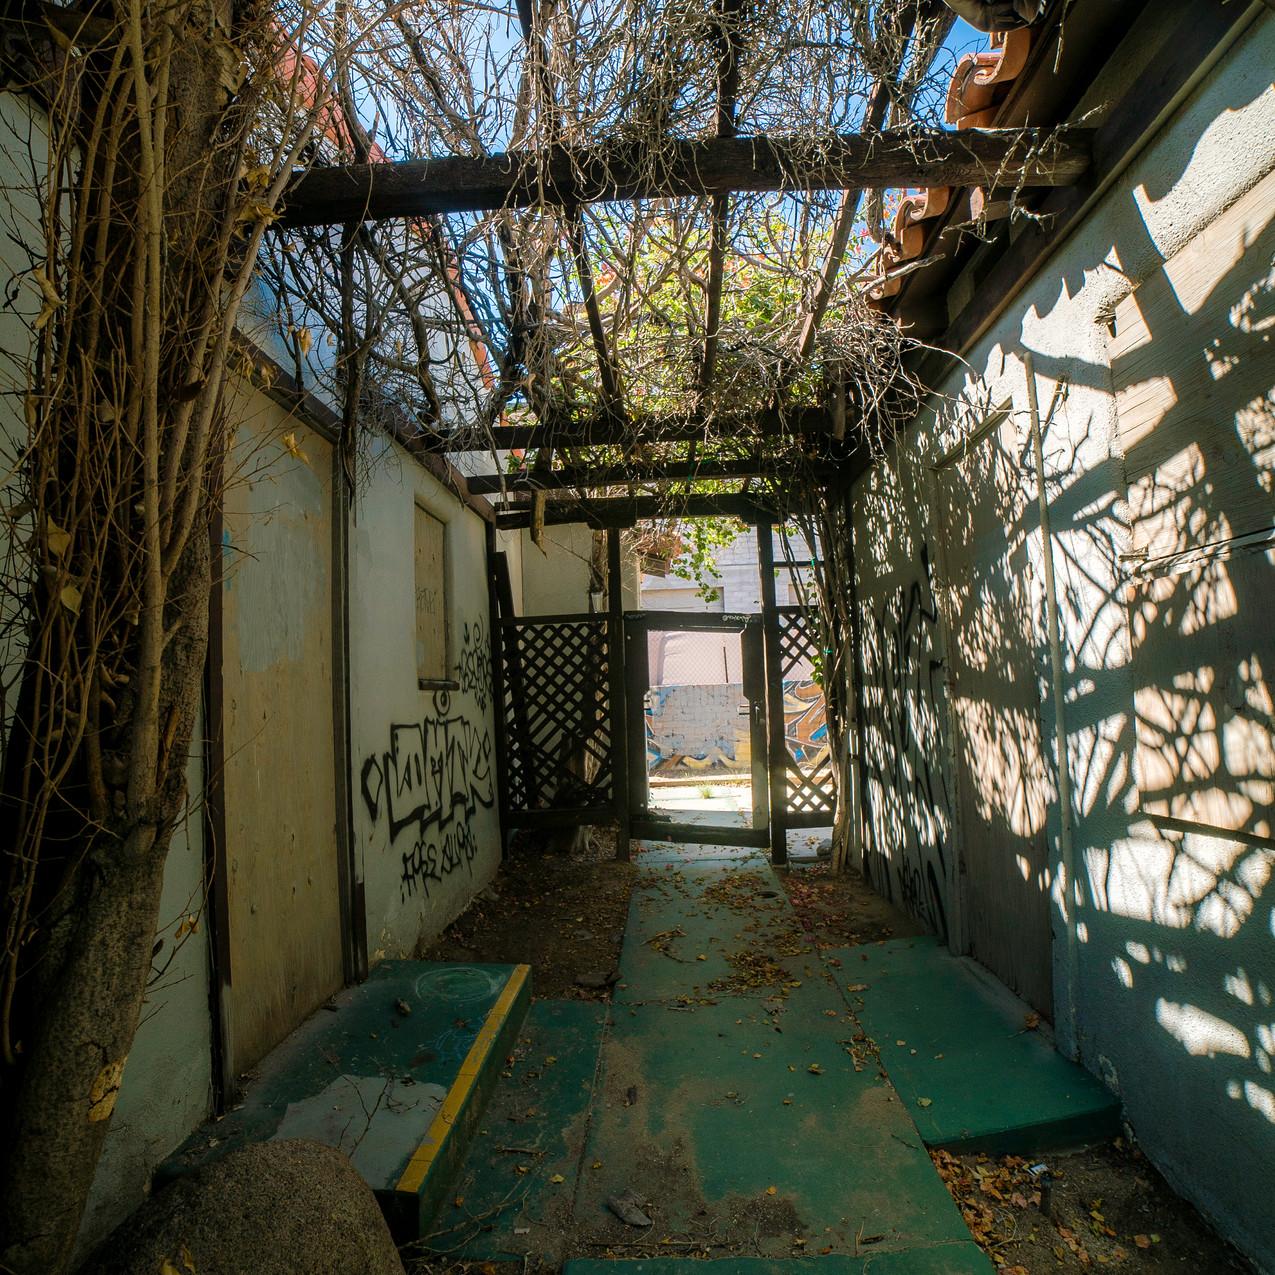 2017-09-27 Abandoned Orchard Tree Inn RAW-6